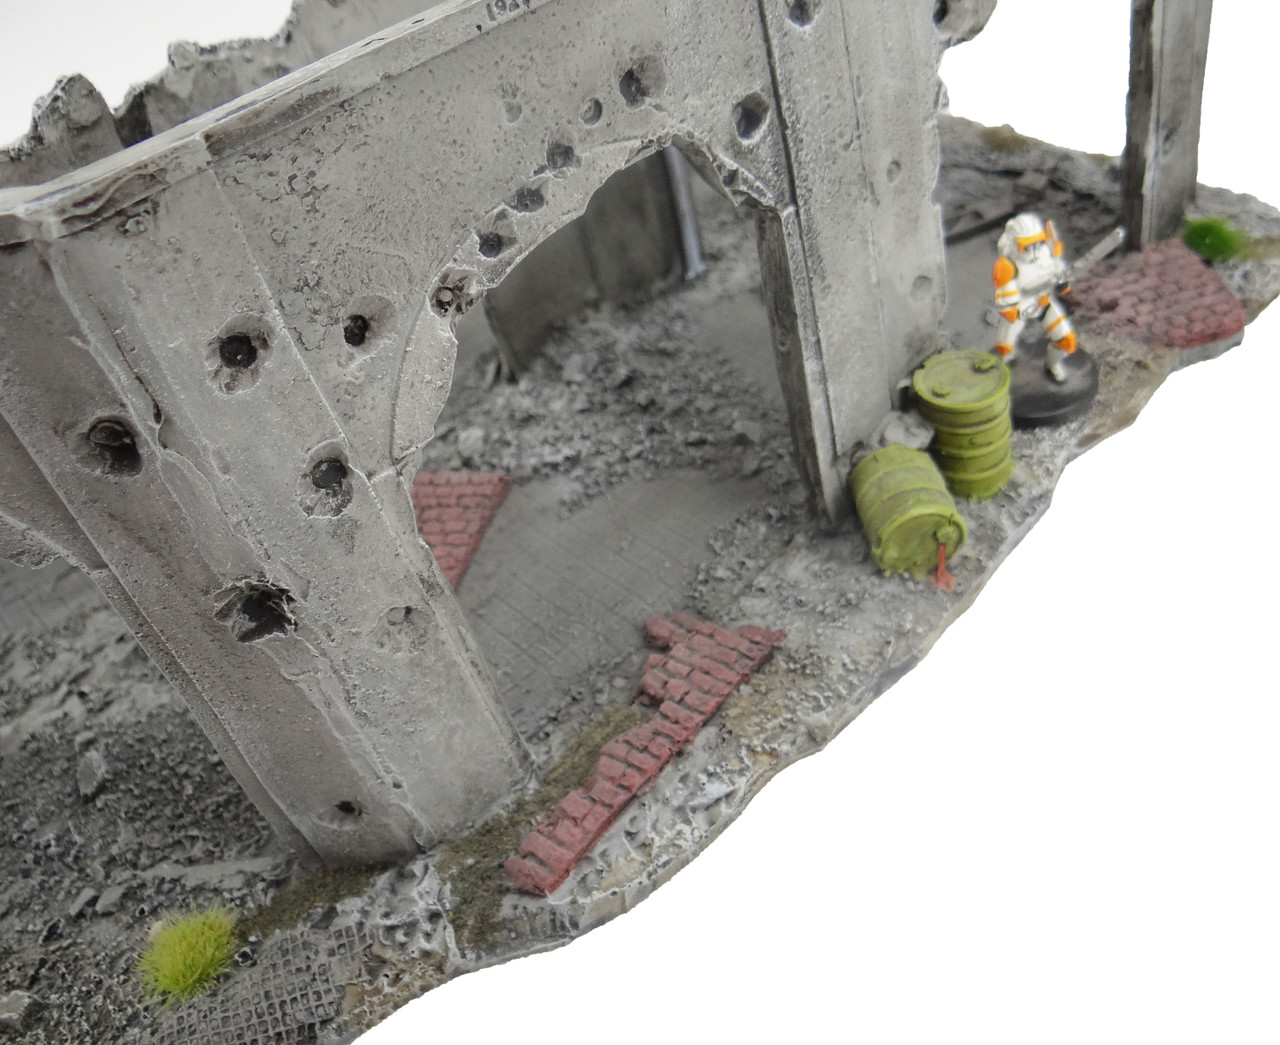 1250-Munitions Factory